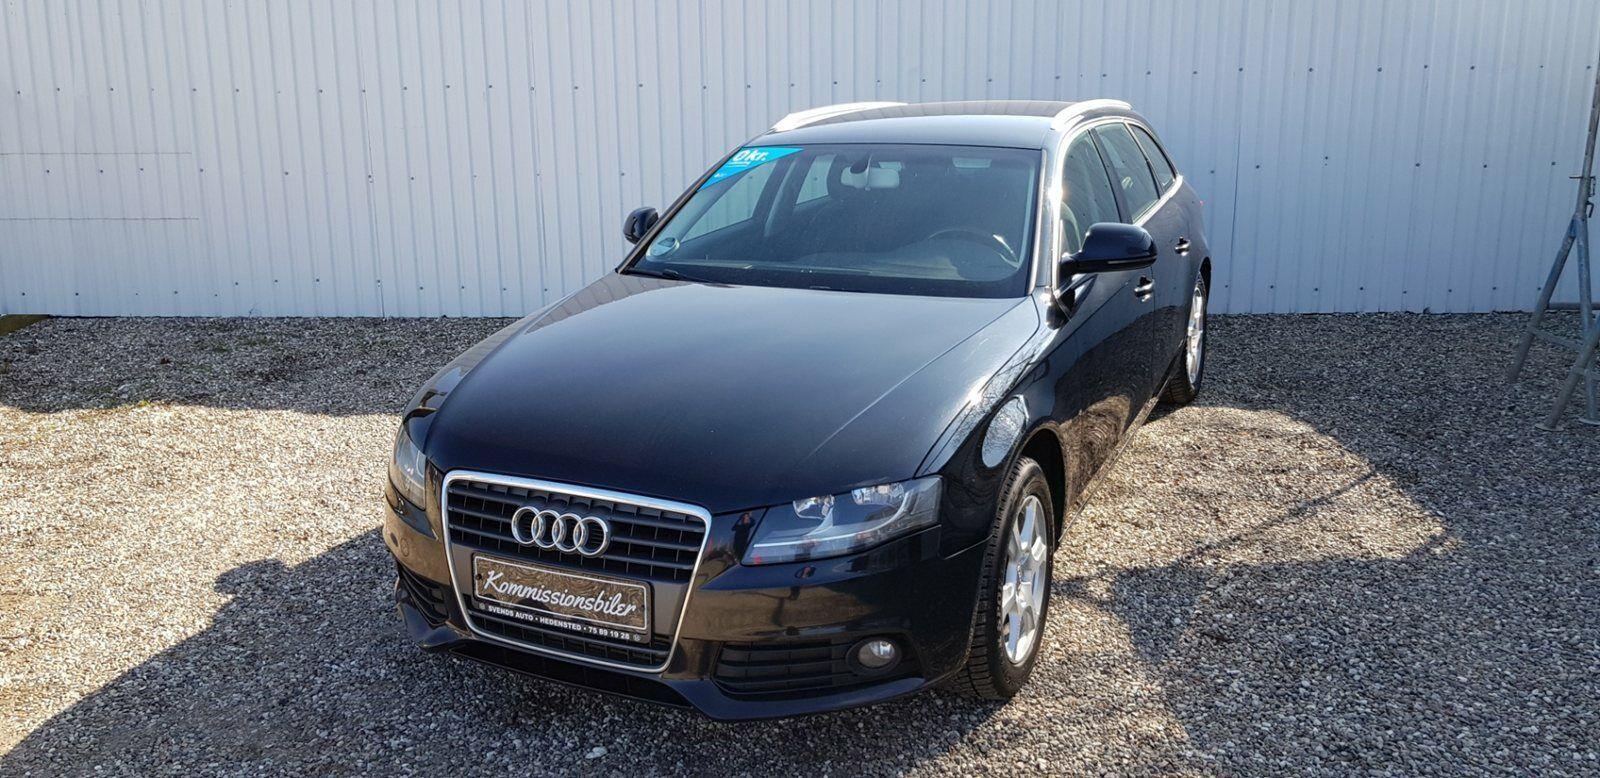 Audi A4 2,0 TDi 143 Avant 5d - 113.000 kr.